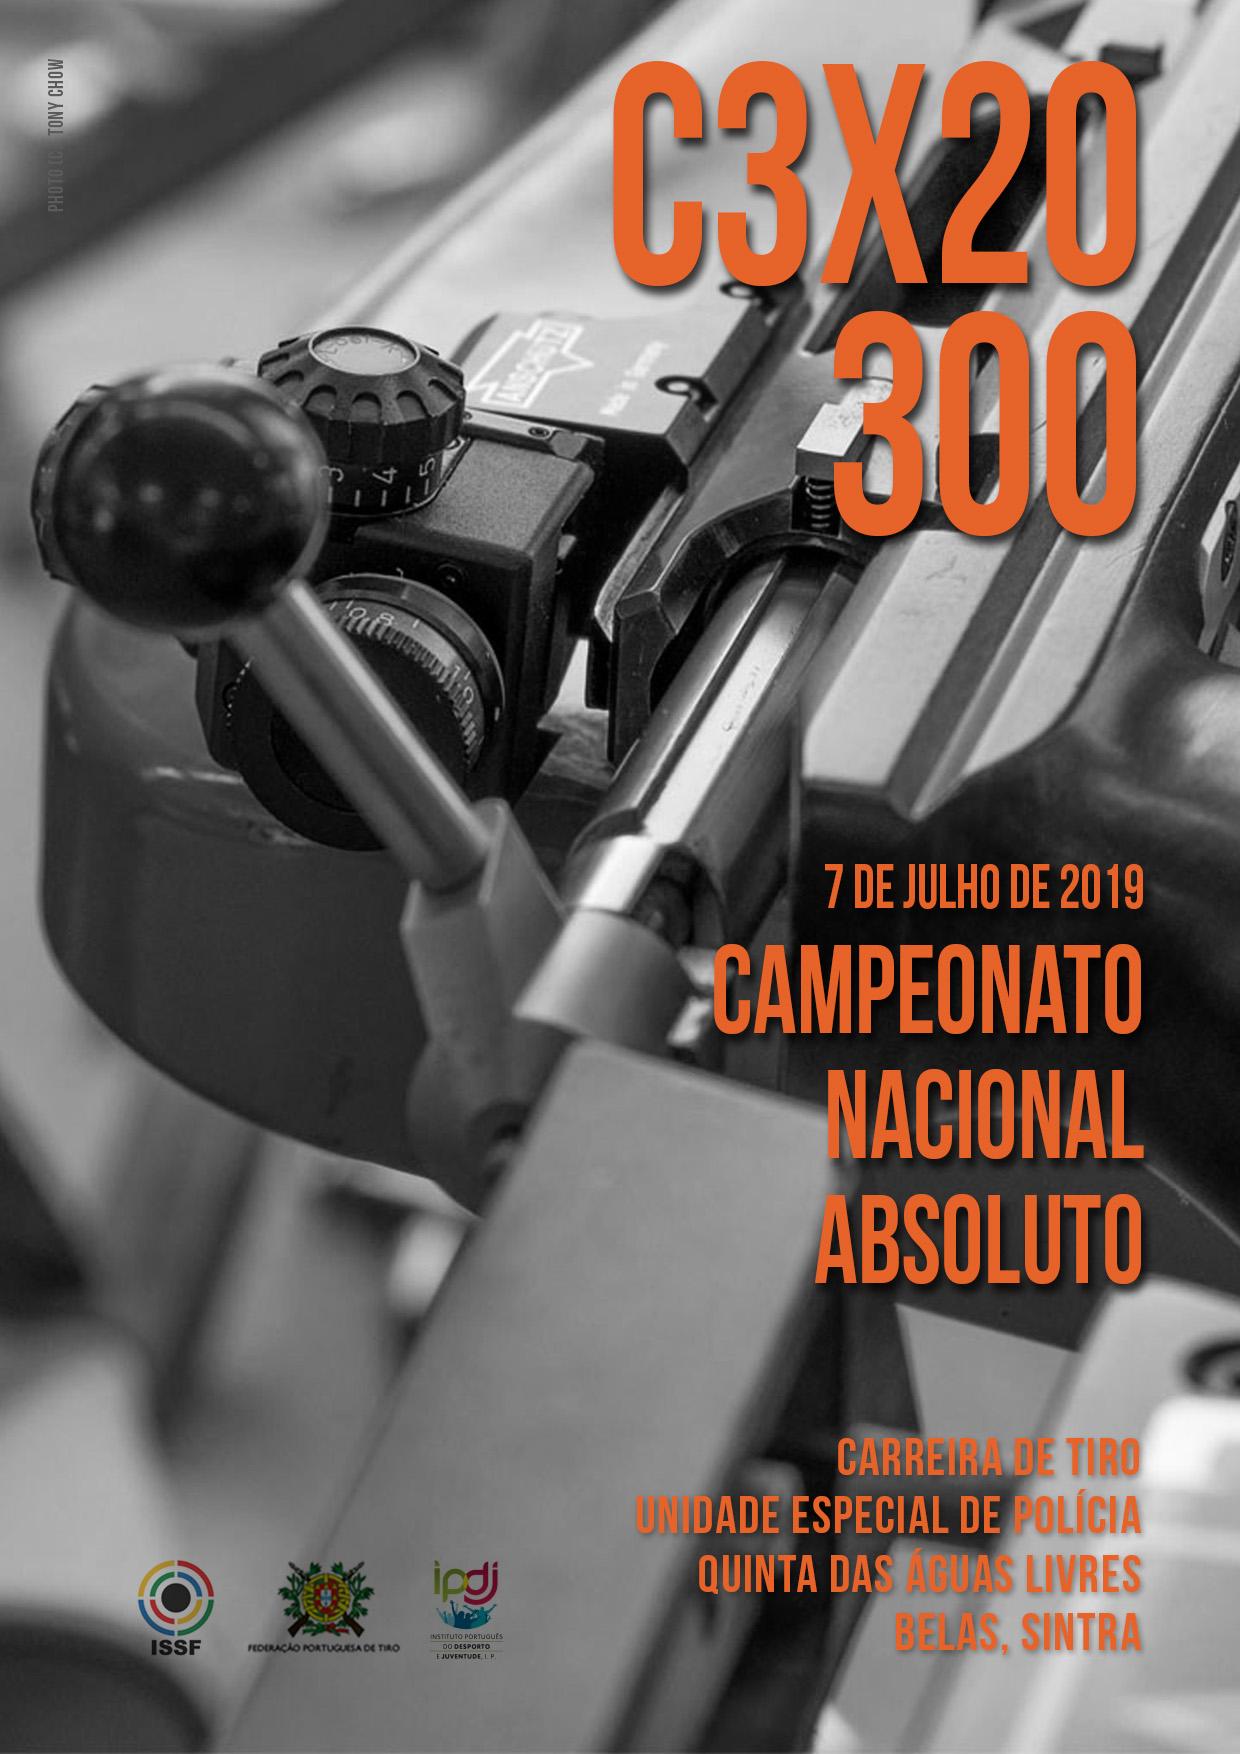 Campeonato Nacional C3x20 300 2019